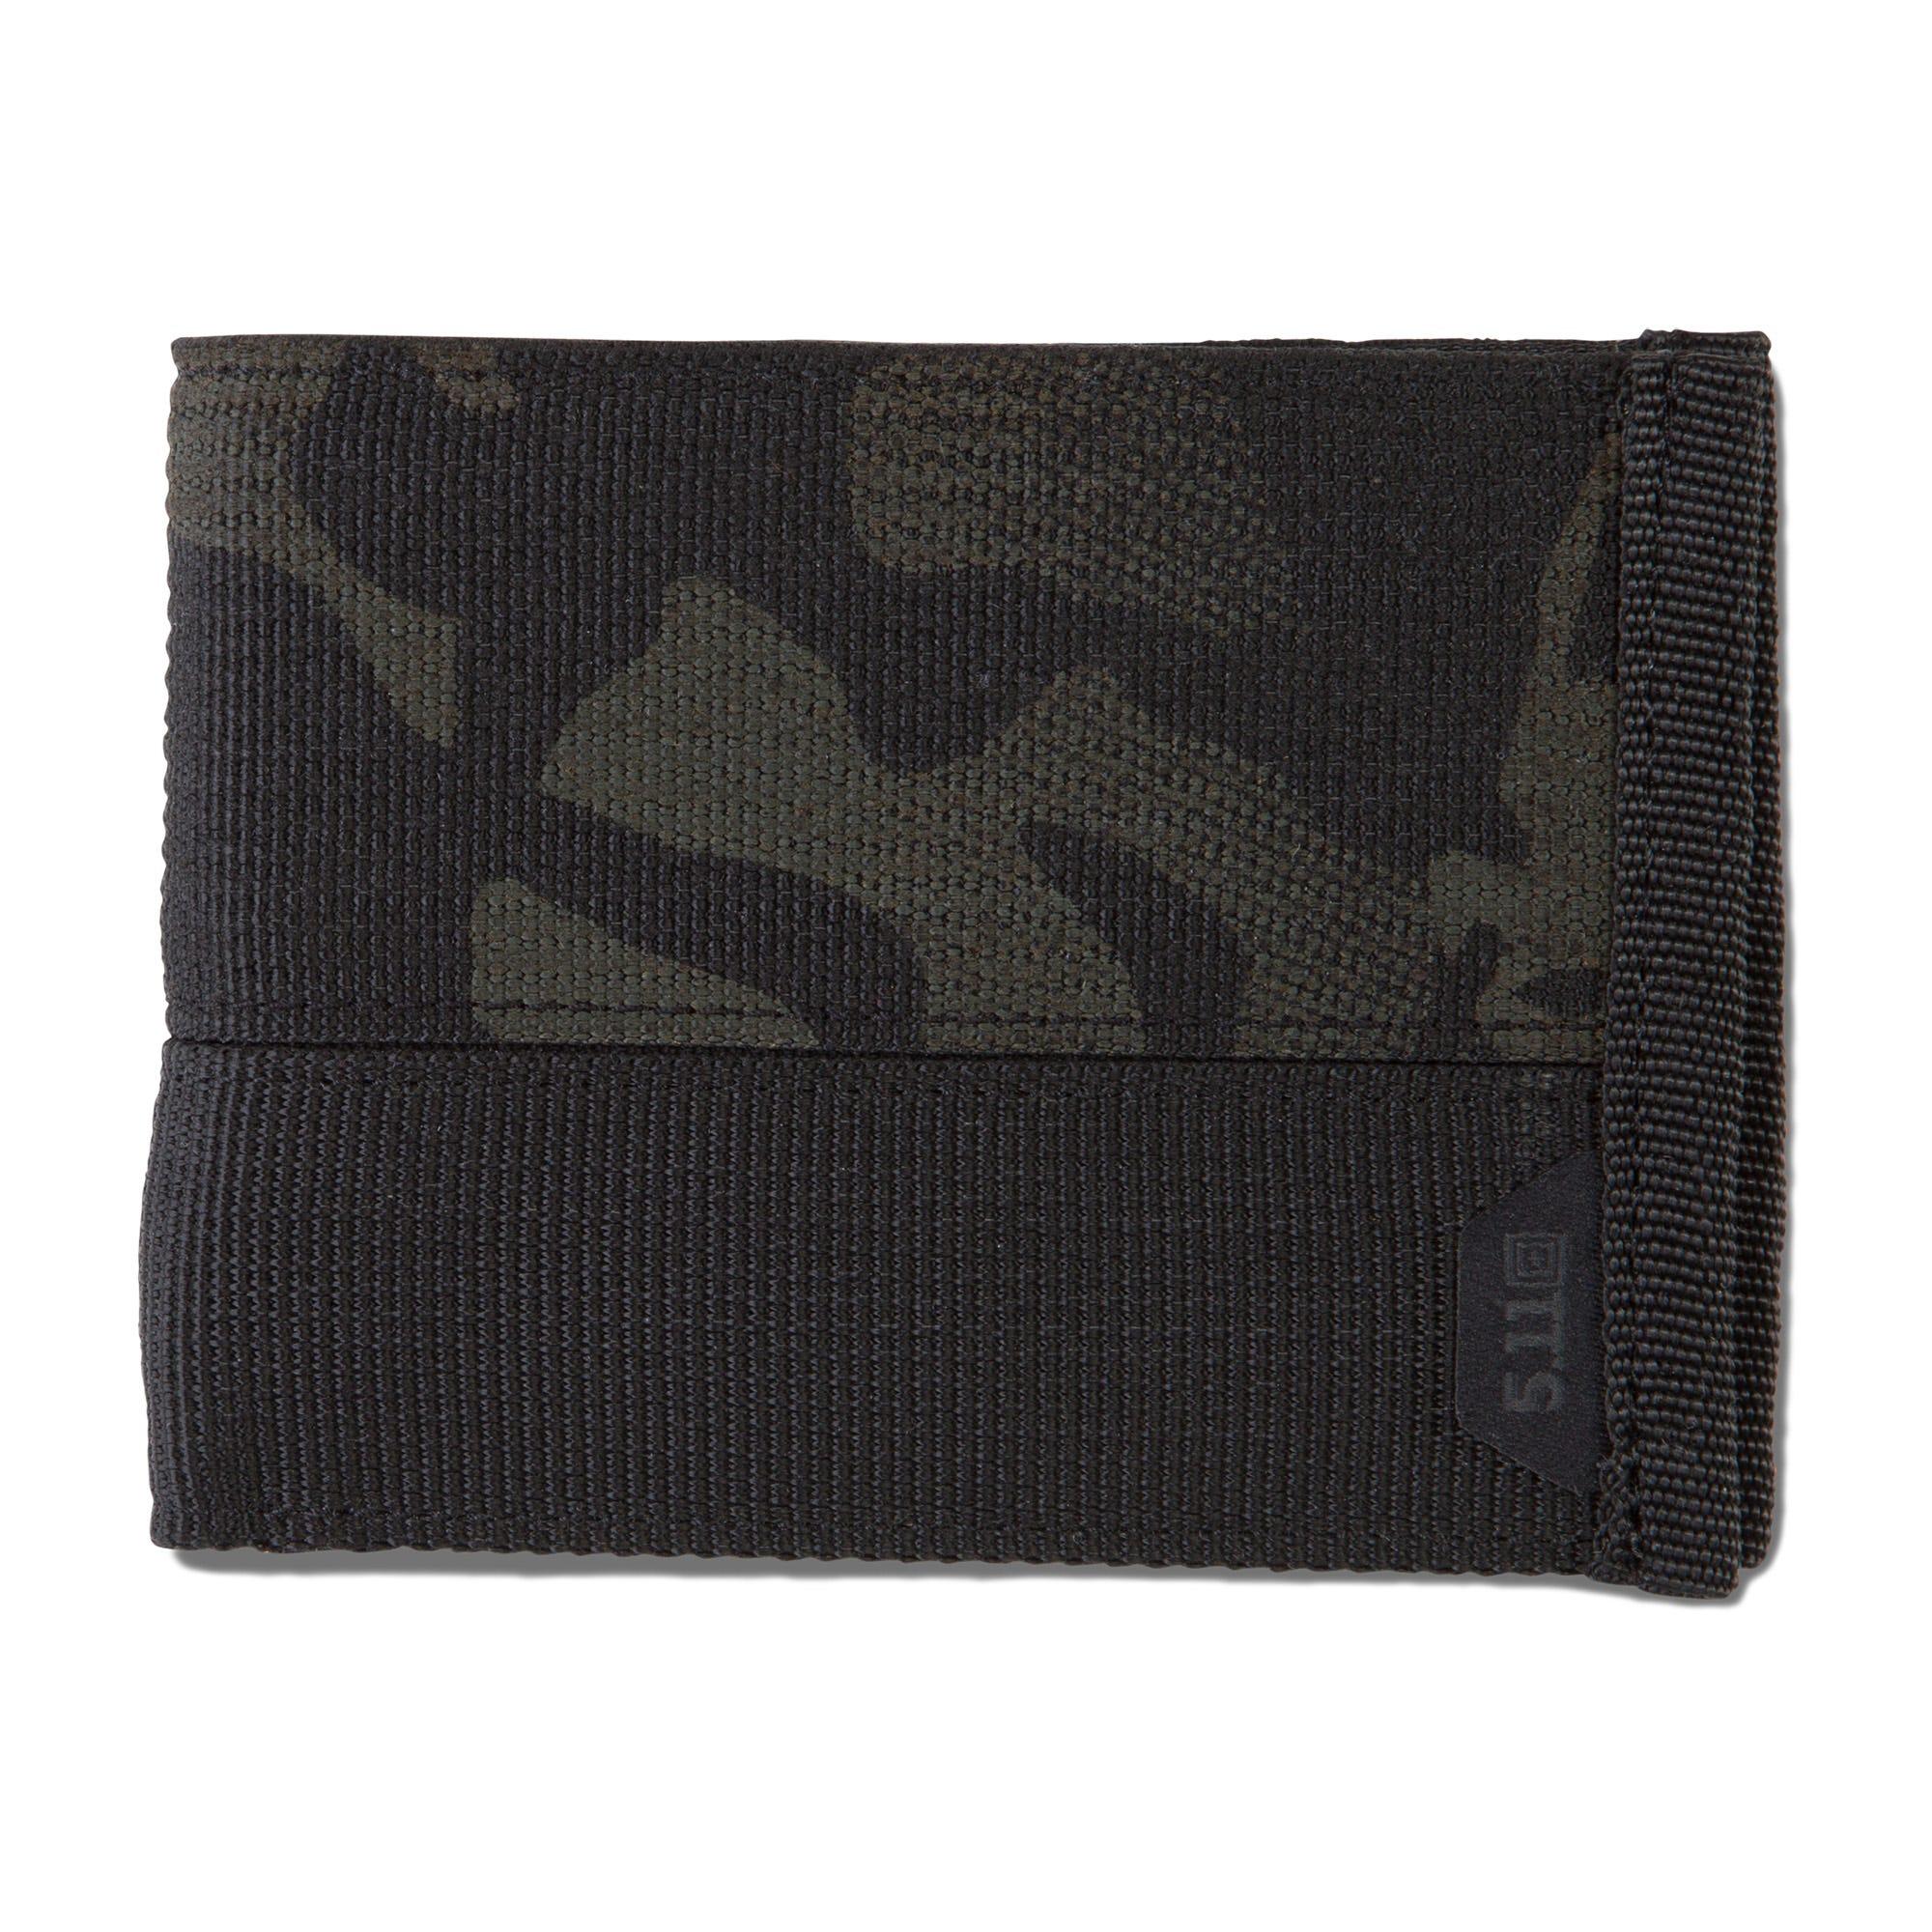 5.11 Tactical Tracker Bifold Wallet (Black)